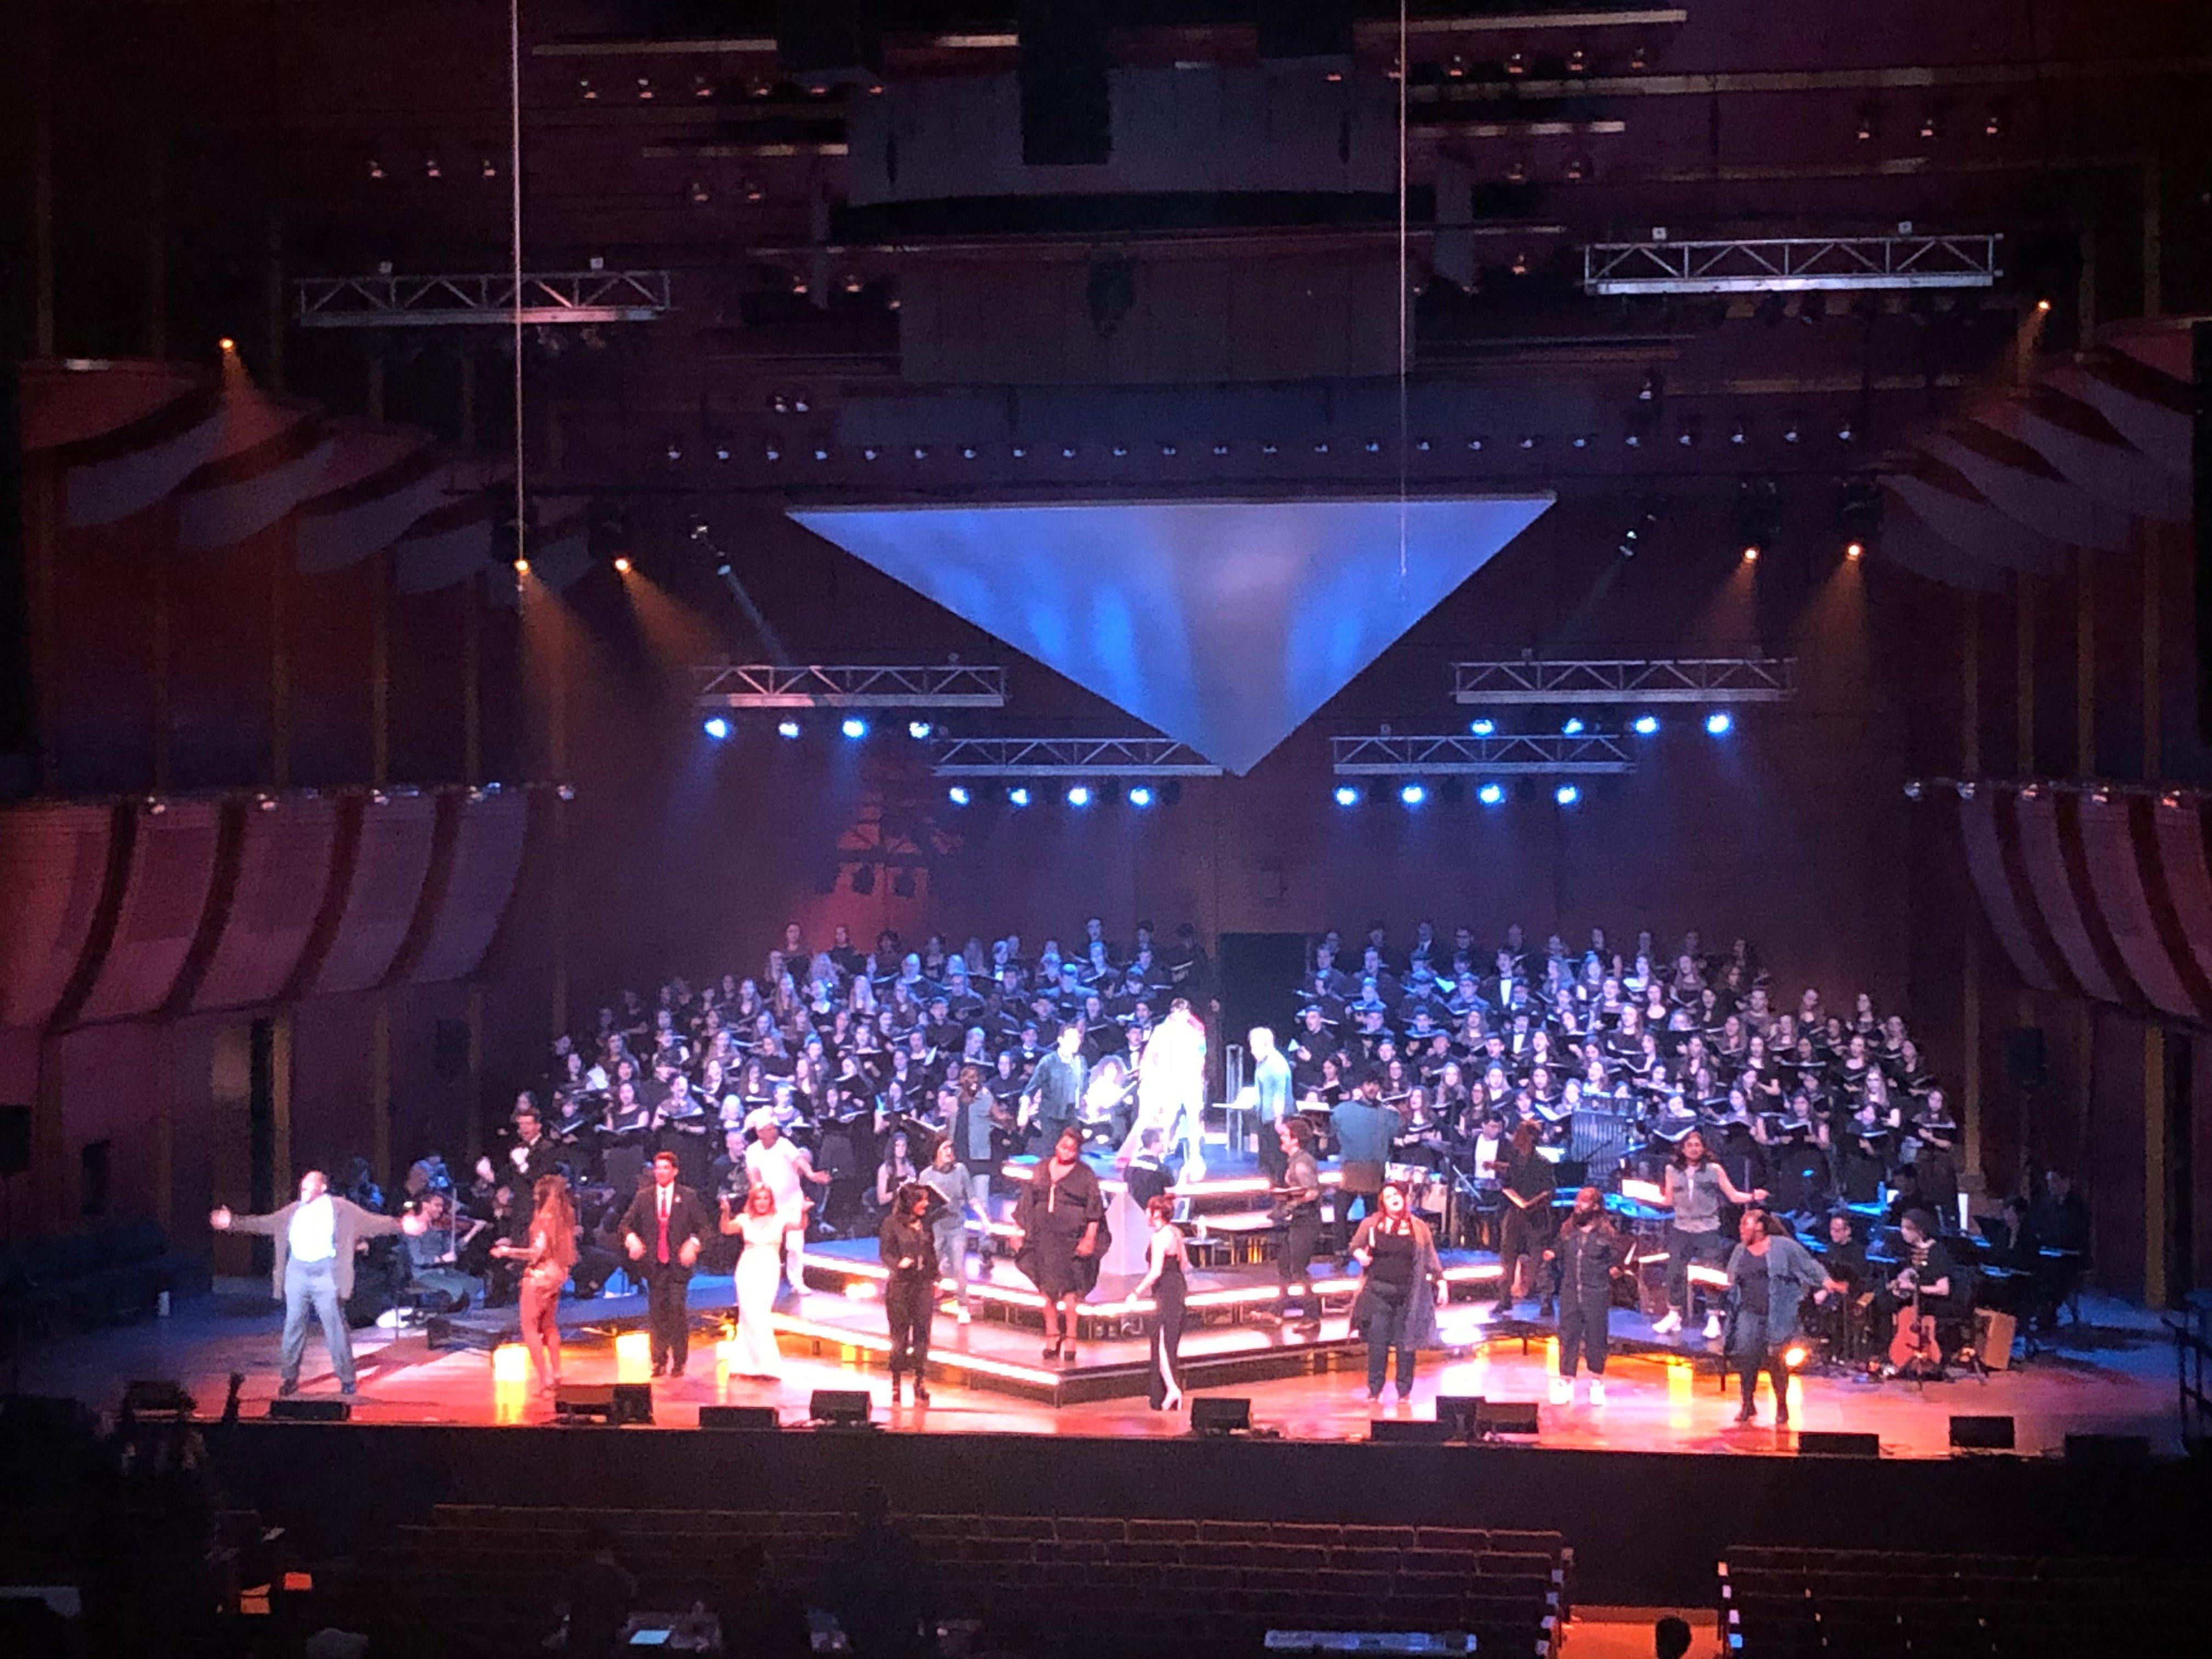 US Chorus 22020 Lincoln Center NYC Joseph Technicolor Dreamcoat